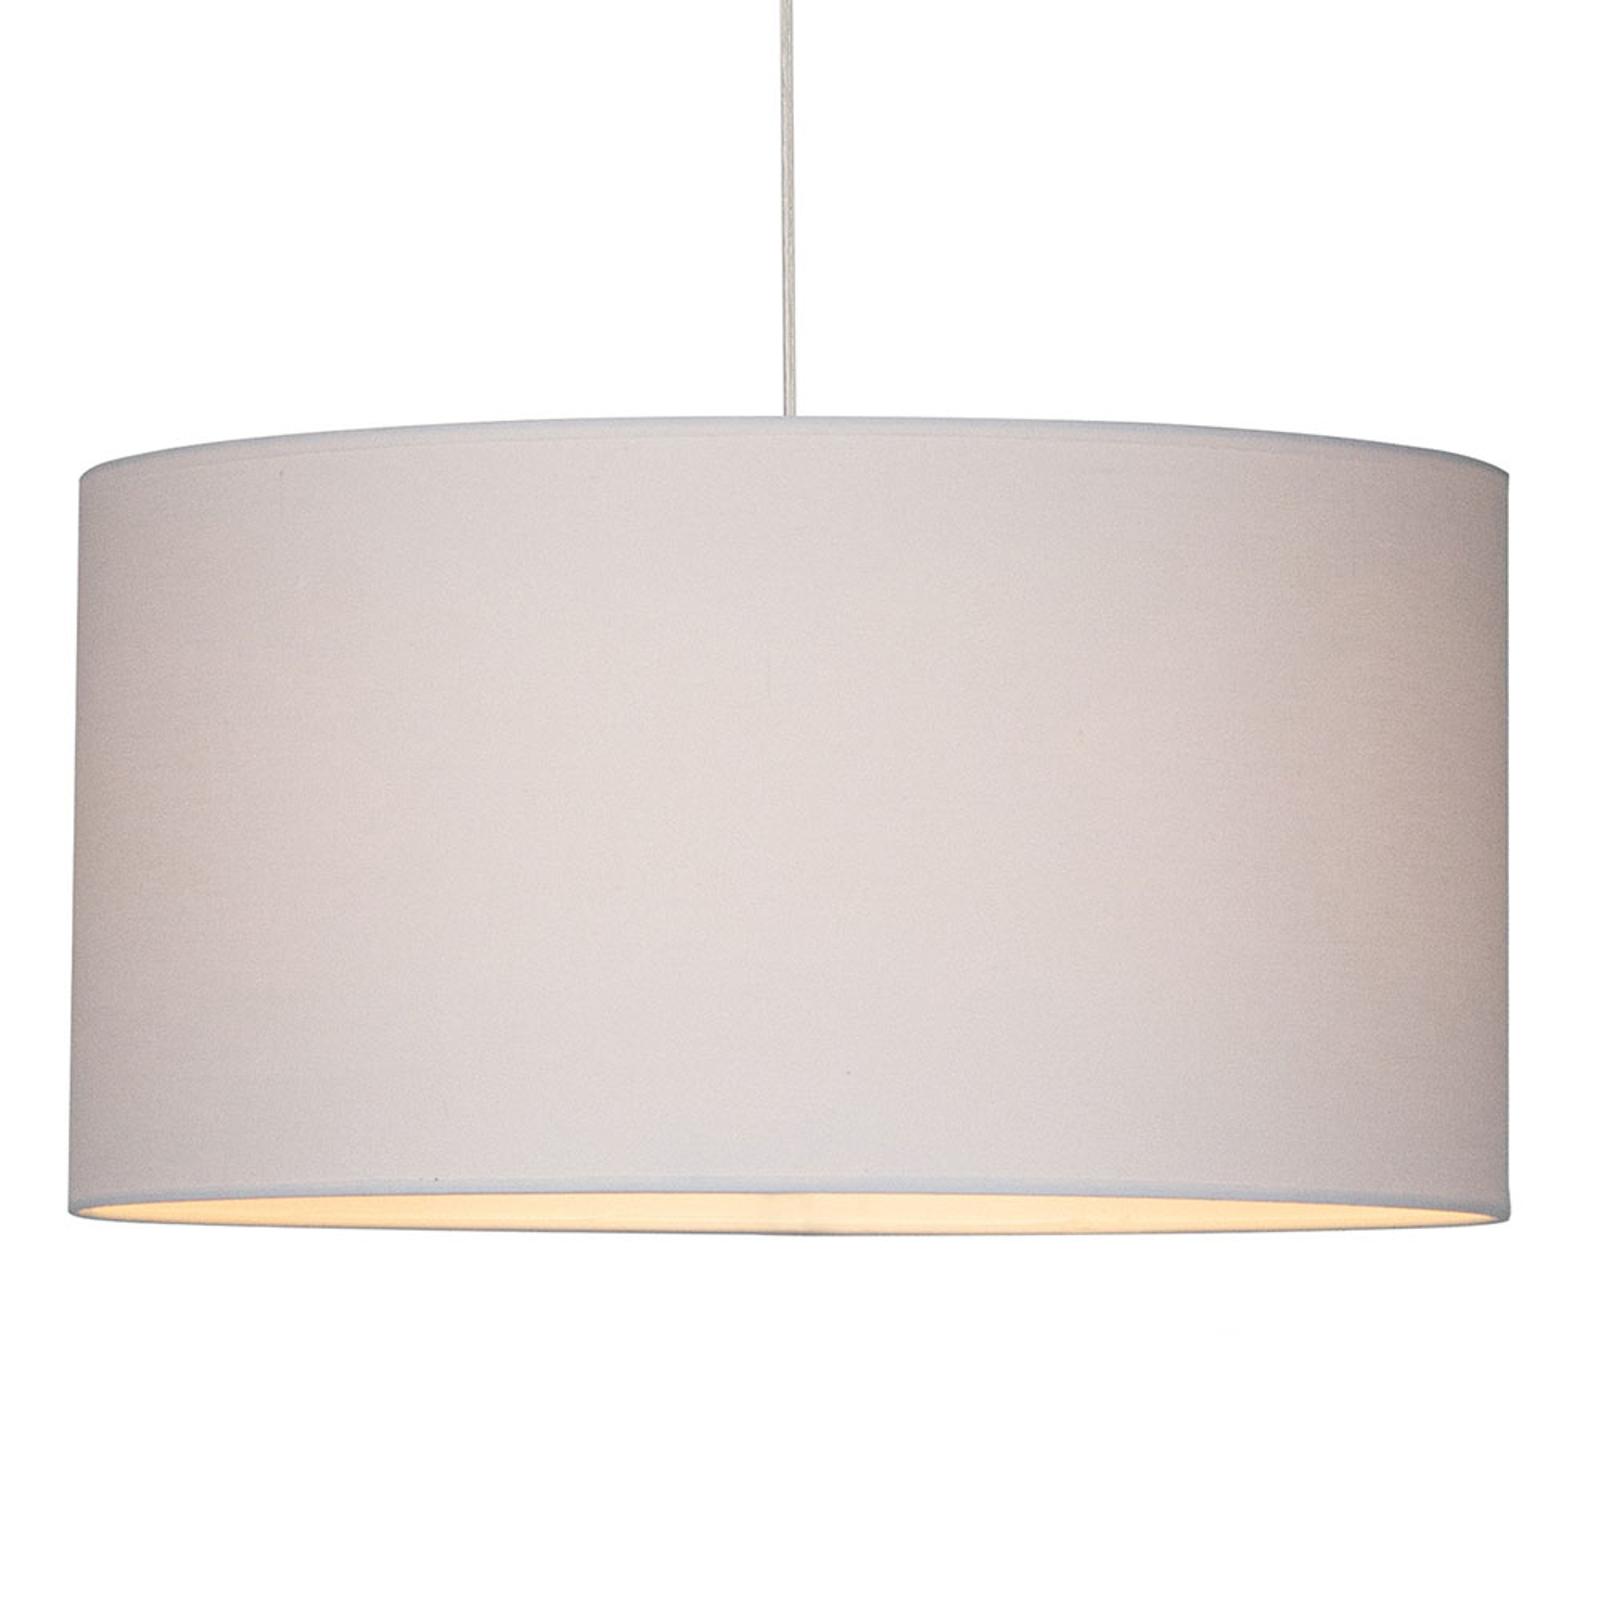 Hanglamp Corralee, wit, 1-lamp